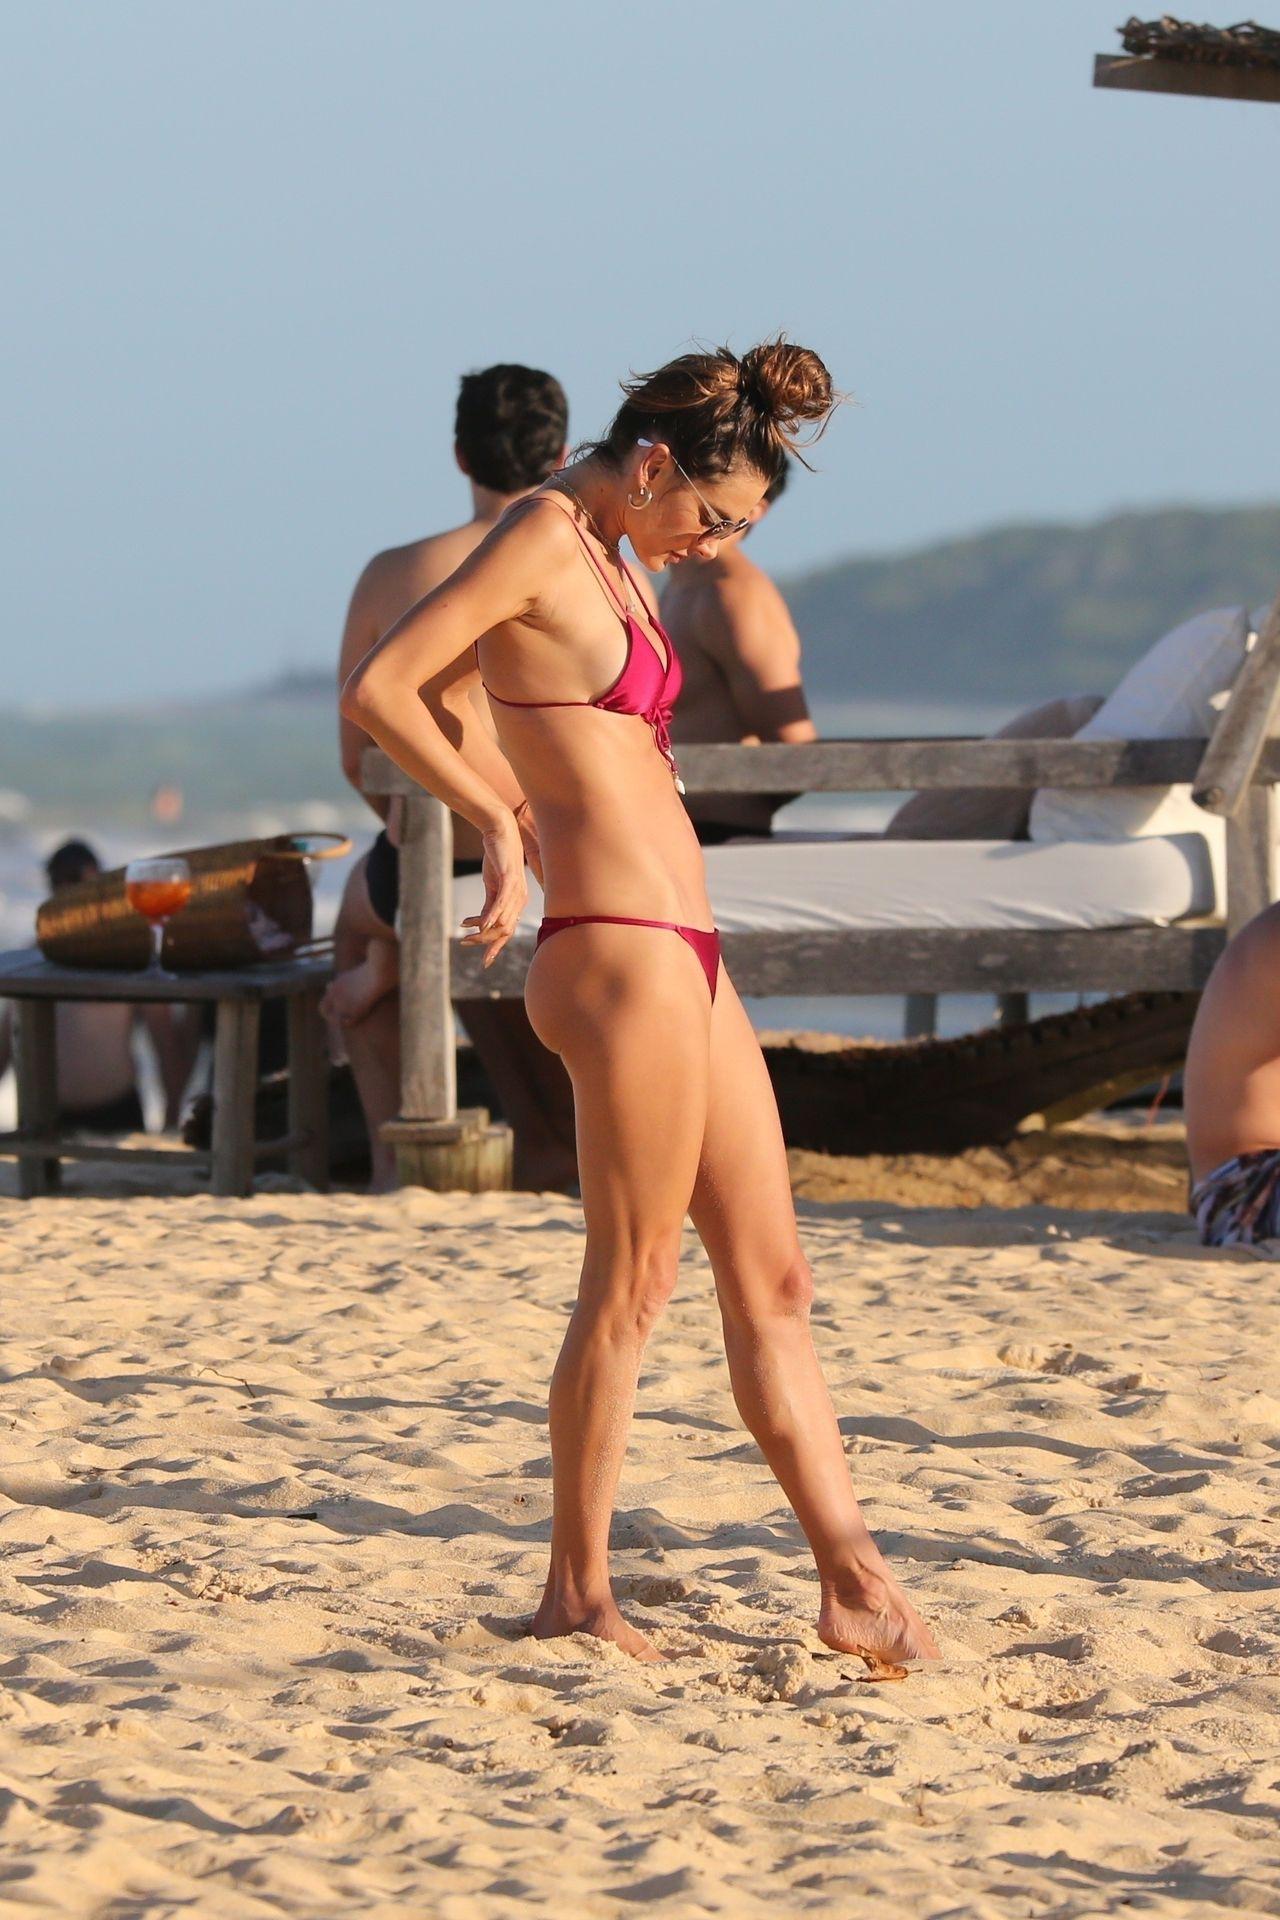 Alessandra-Ambrosio-Sexy-46-thefappeningblog.com_-1.jpg